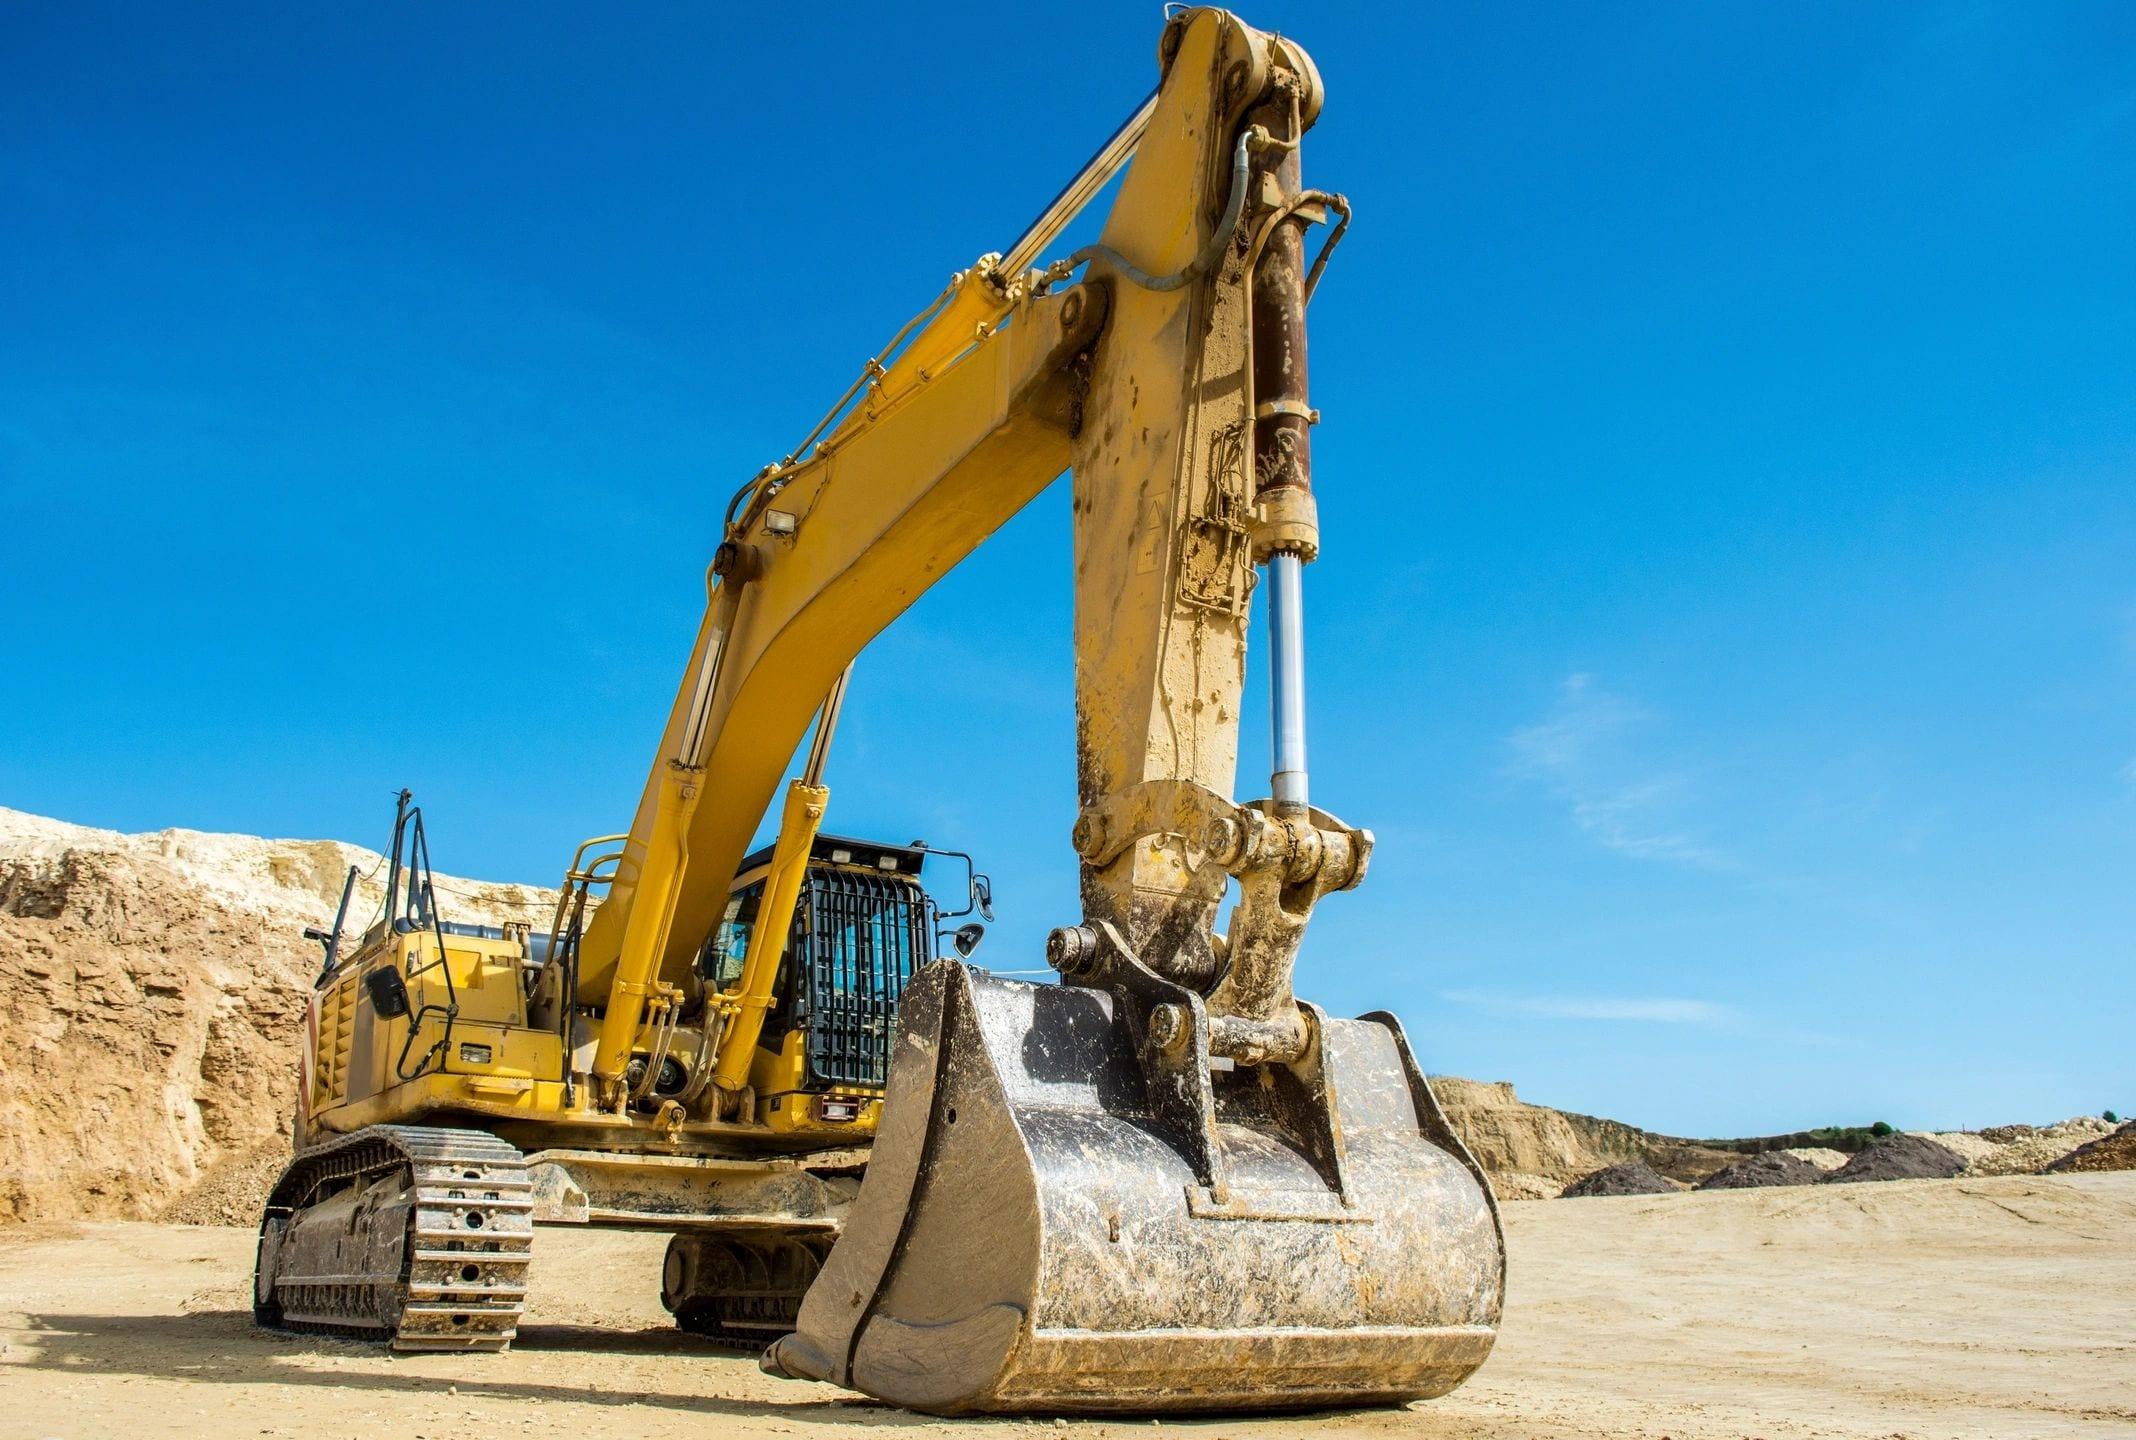 Antioch Excavating Work